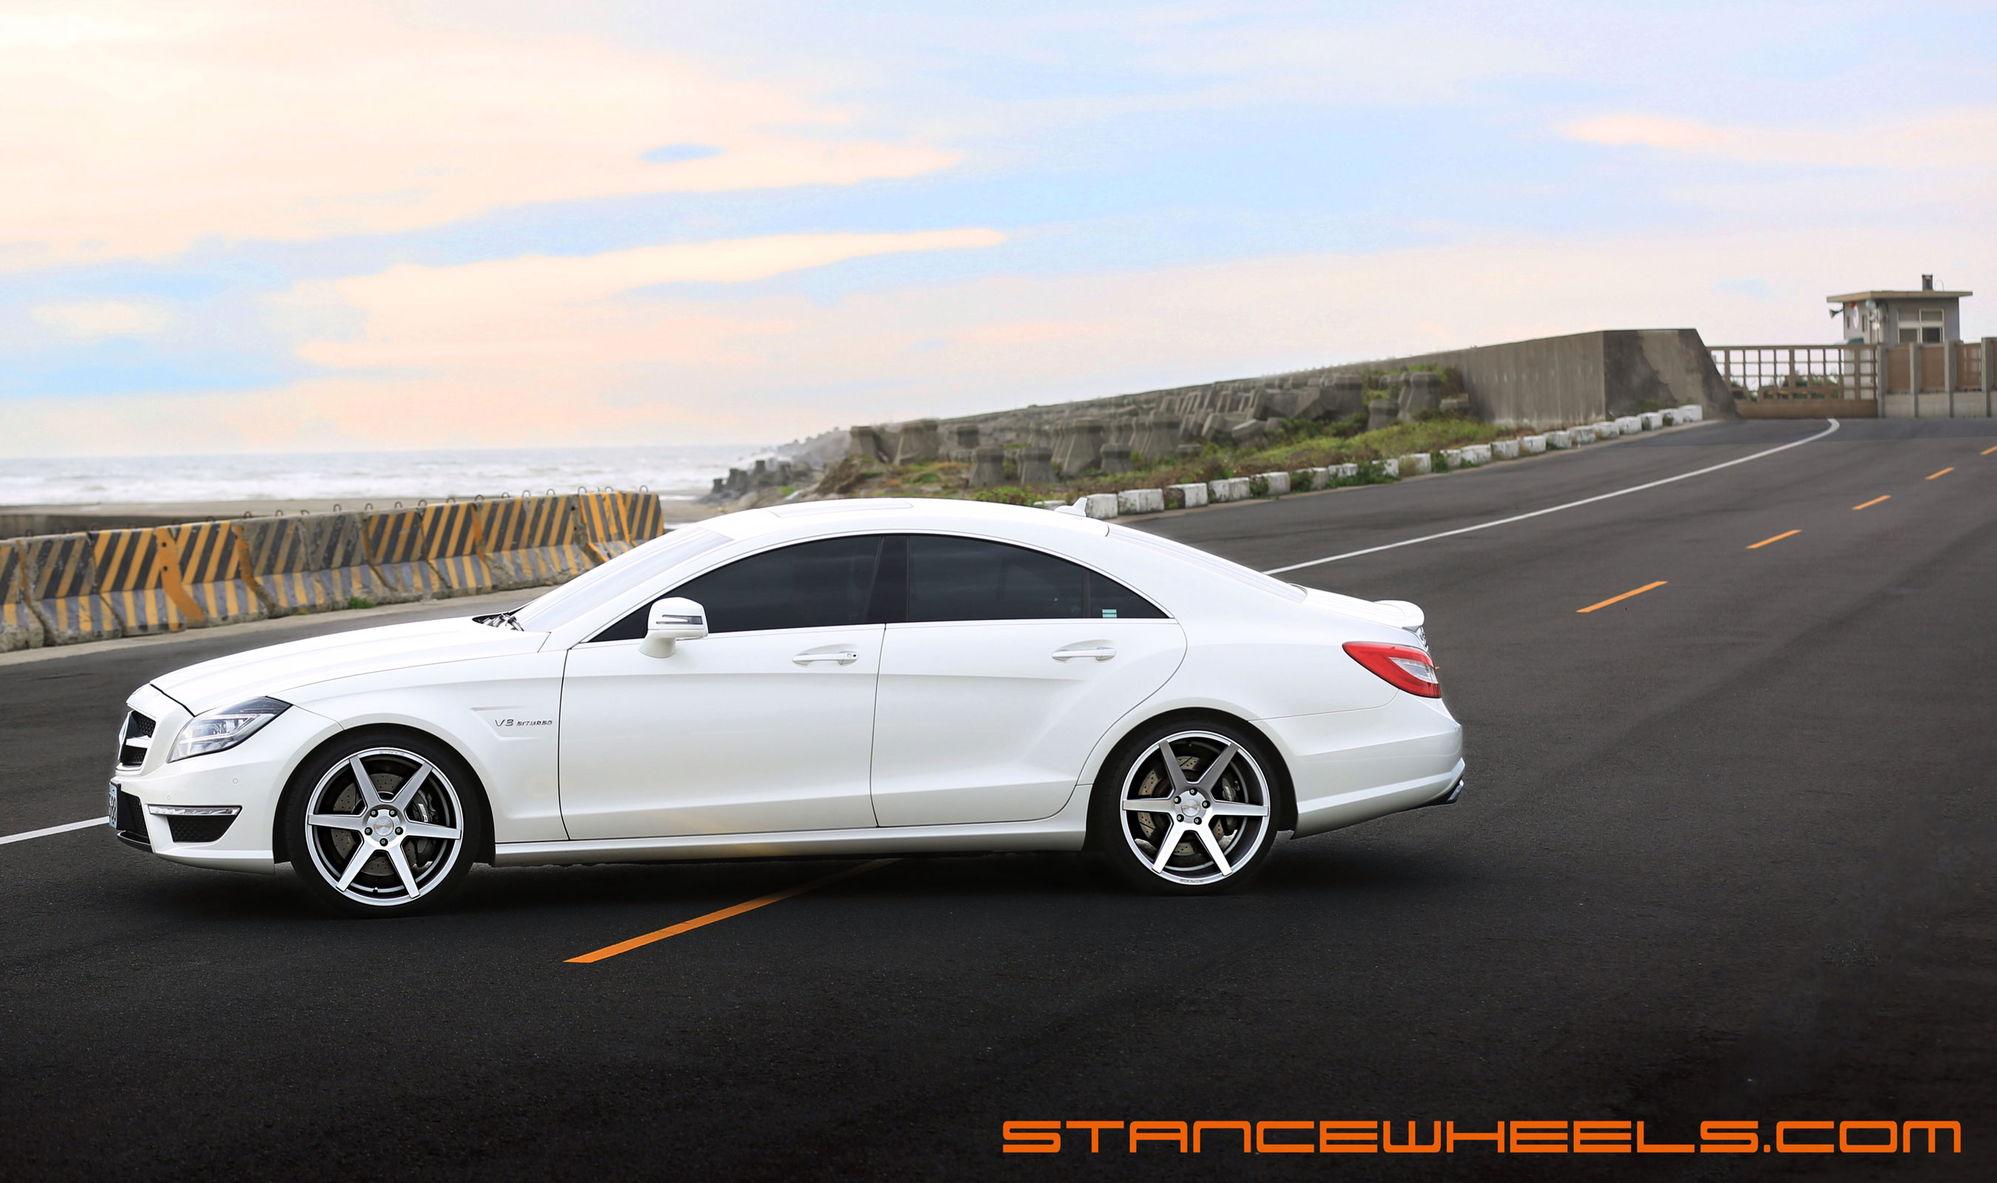 Mercedes benz cls63 amg w218 on stance sc 6 wheels 20x9 for Mercedes benz 6 wheel